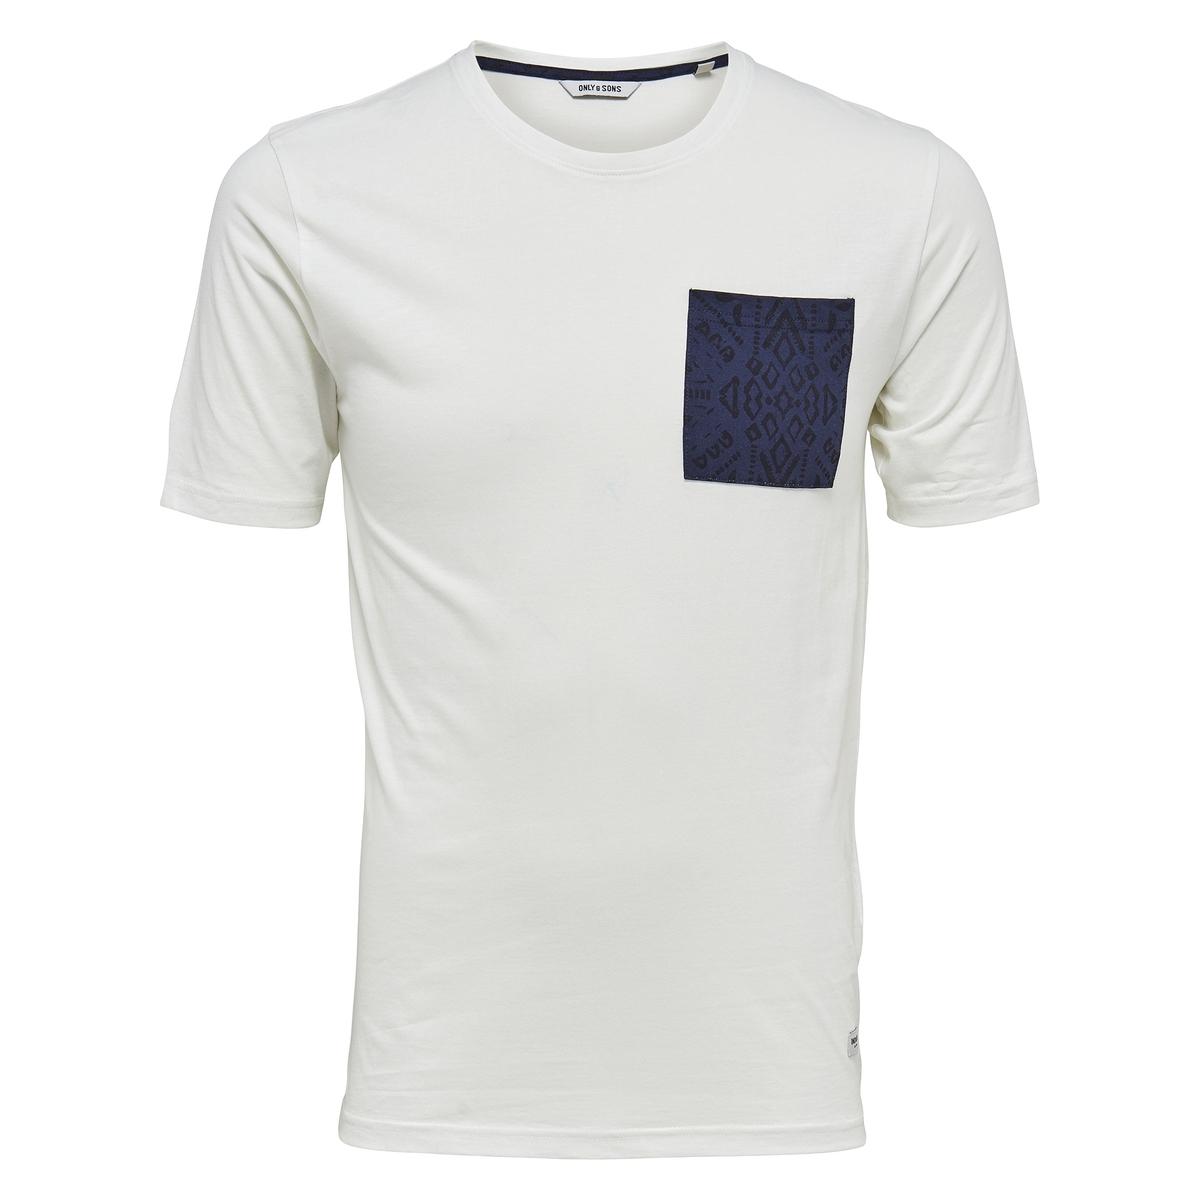 Футболка ONSDREW с нагрудным карманом